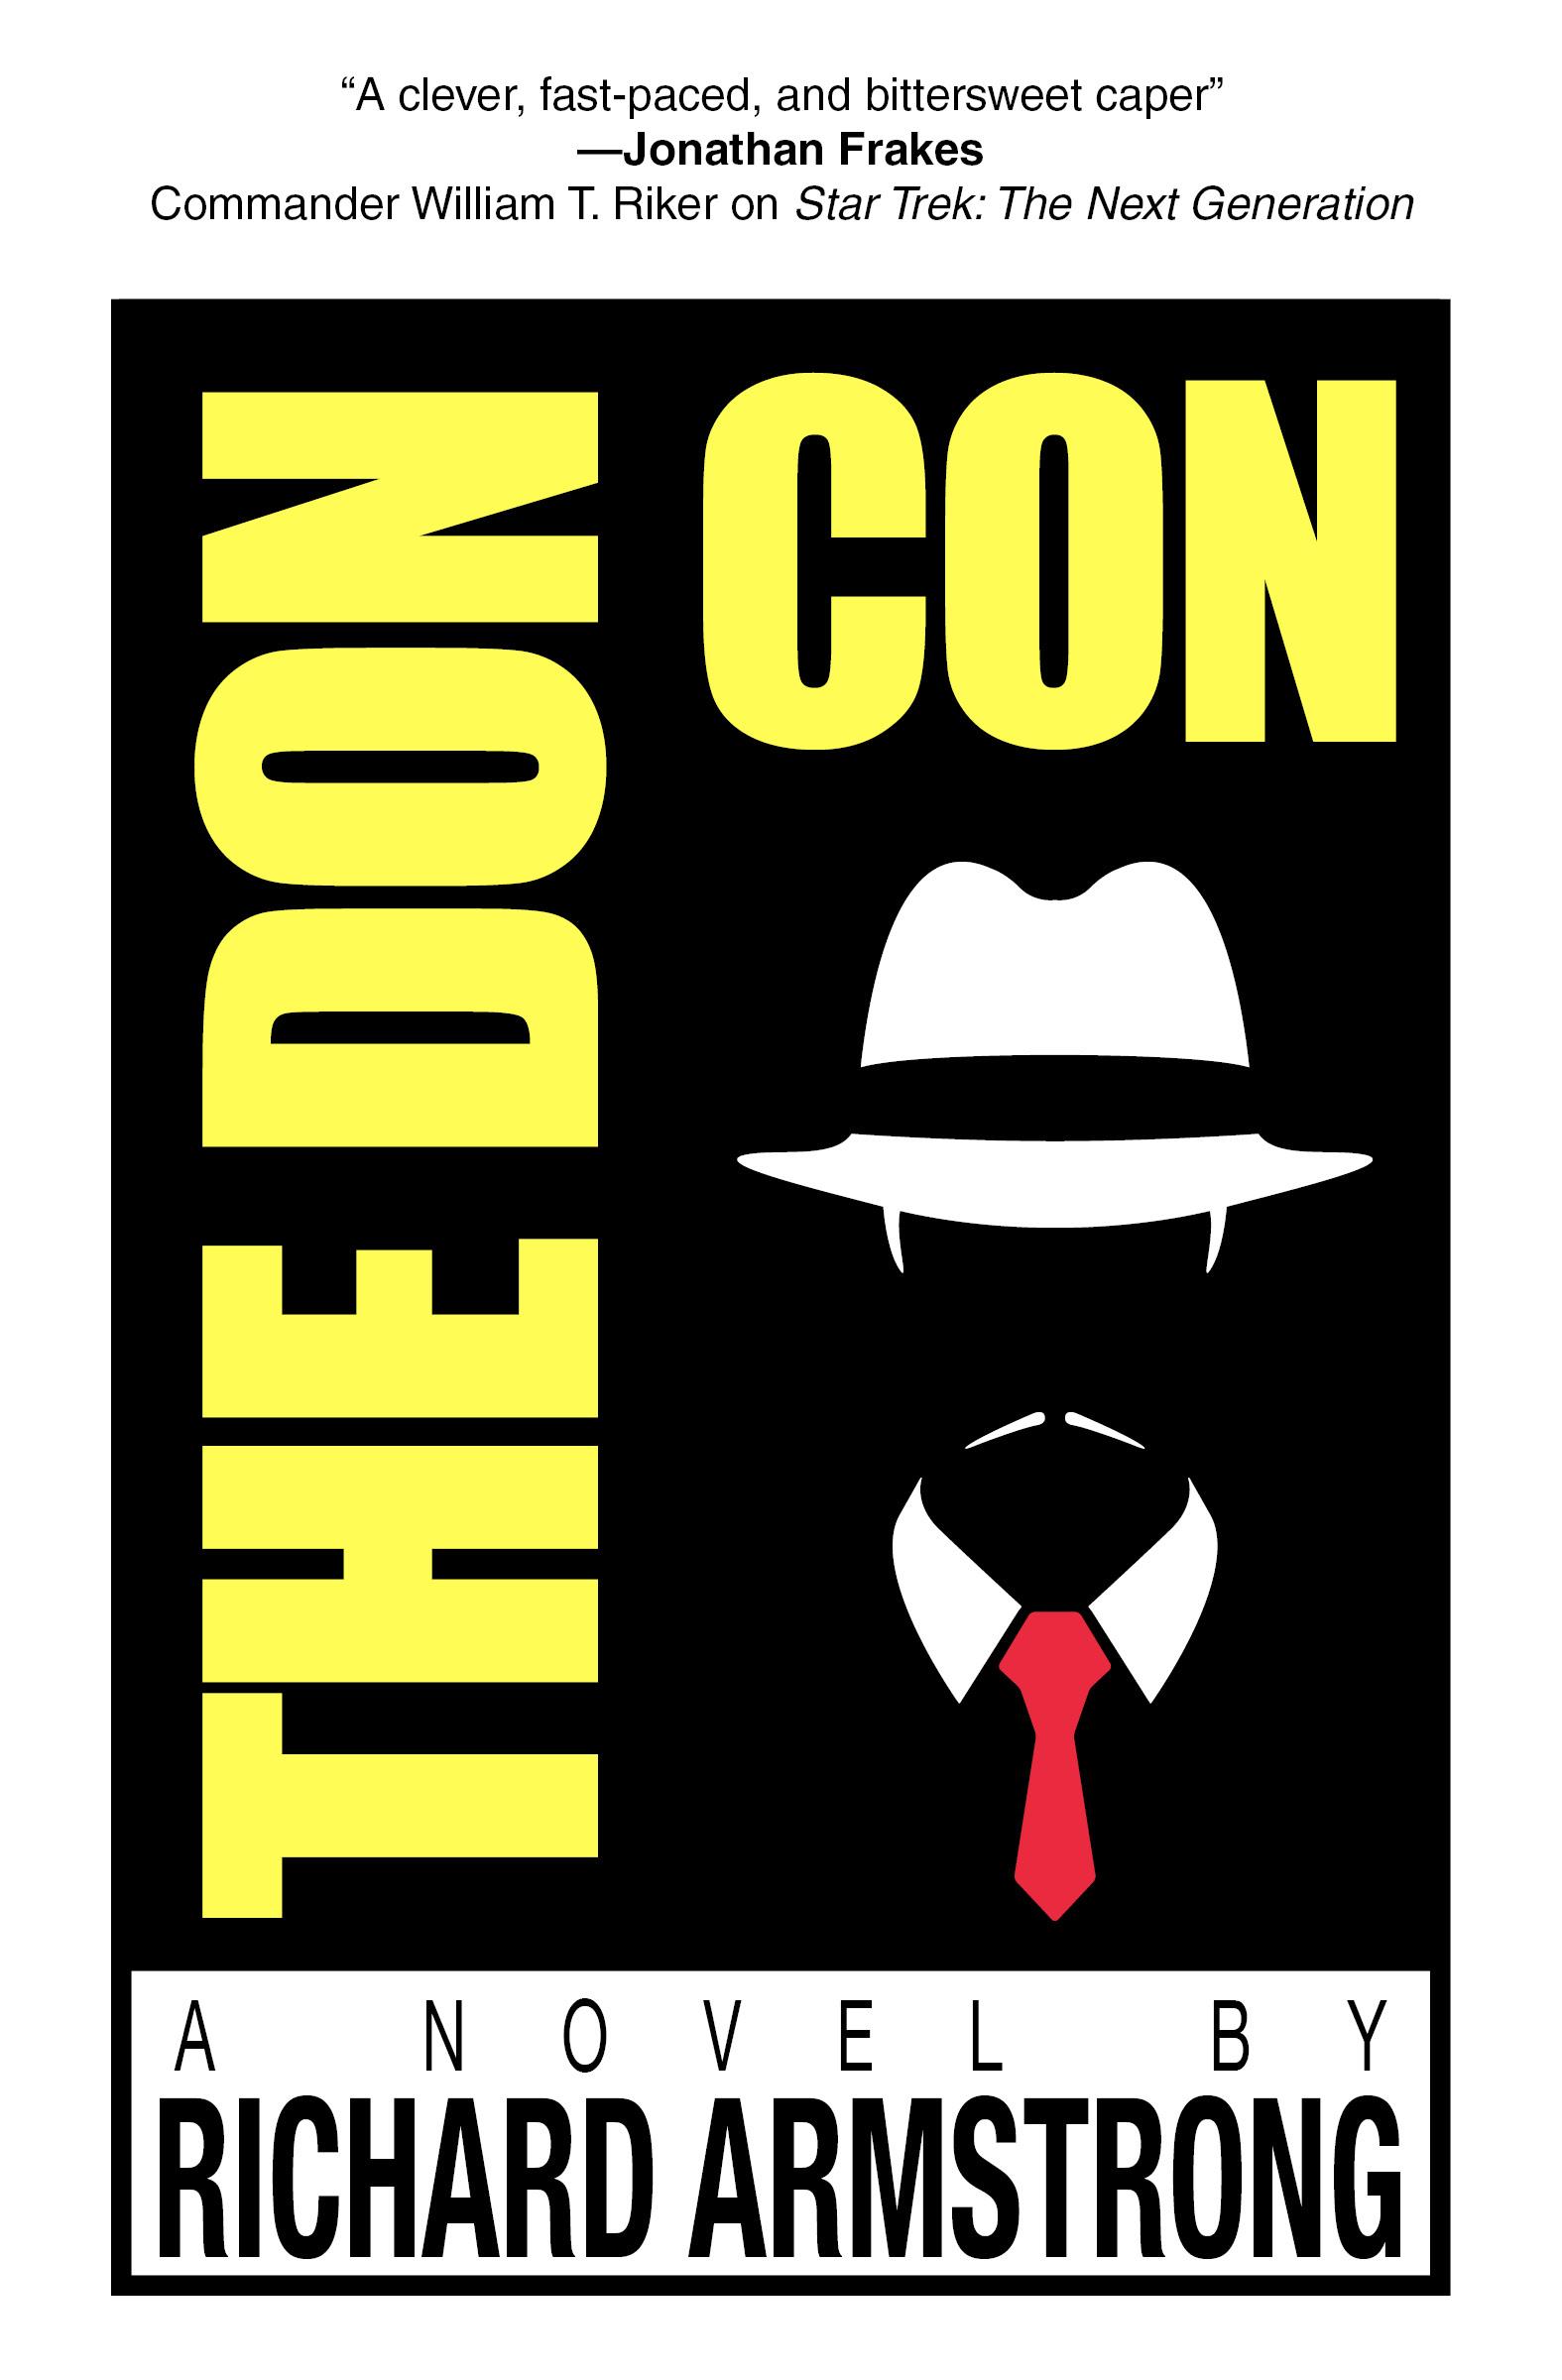 The Don Con Cover